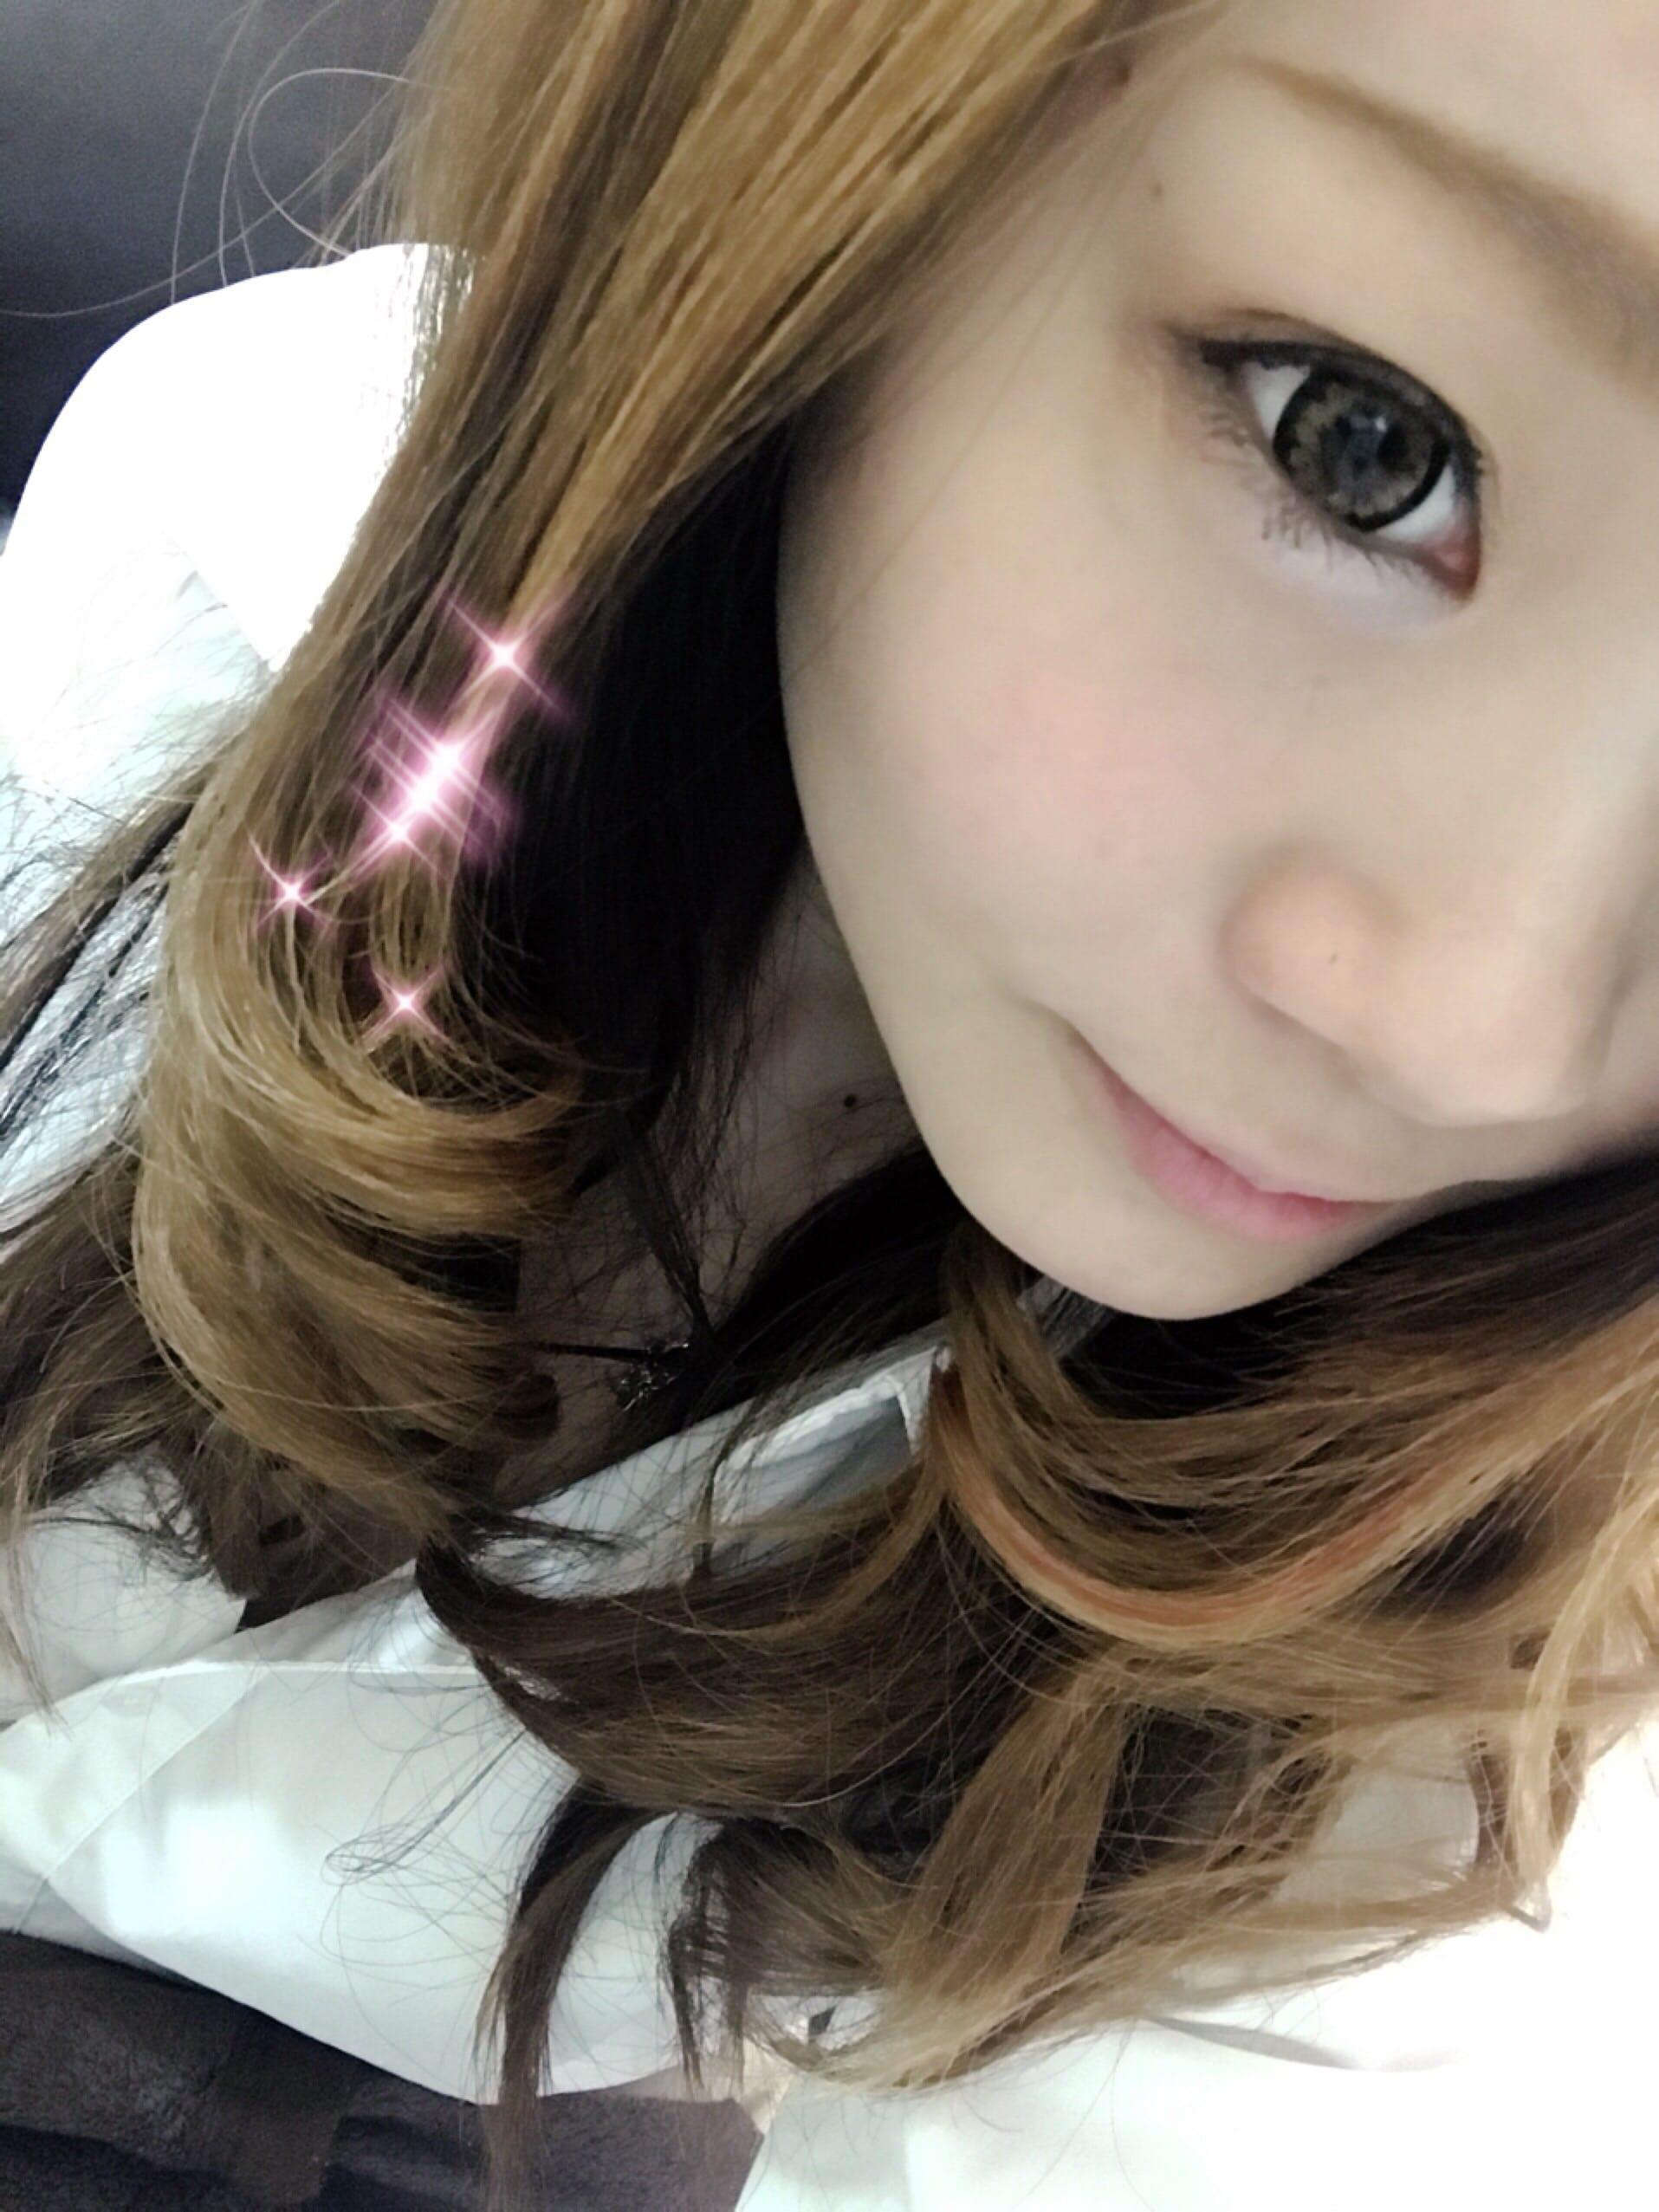 「Yくん♡」02/28(02/28) 14:11 | 里見 ゆのの写メ・風俗動画